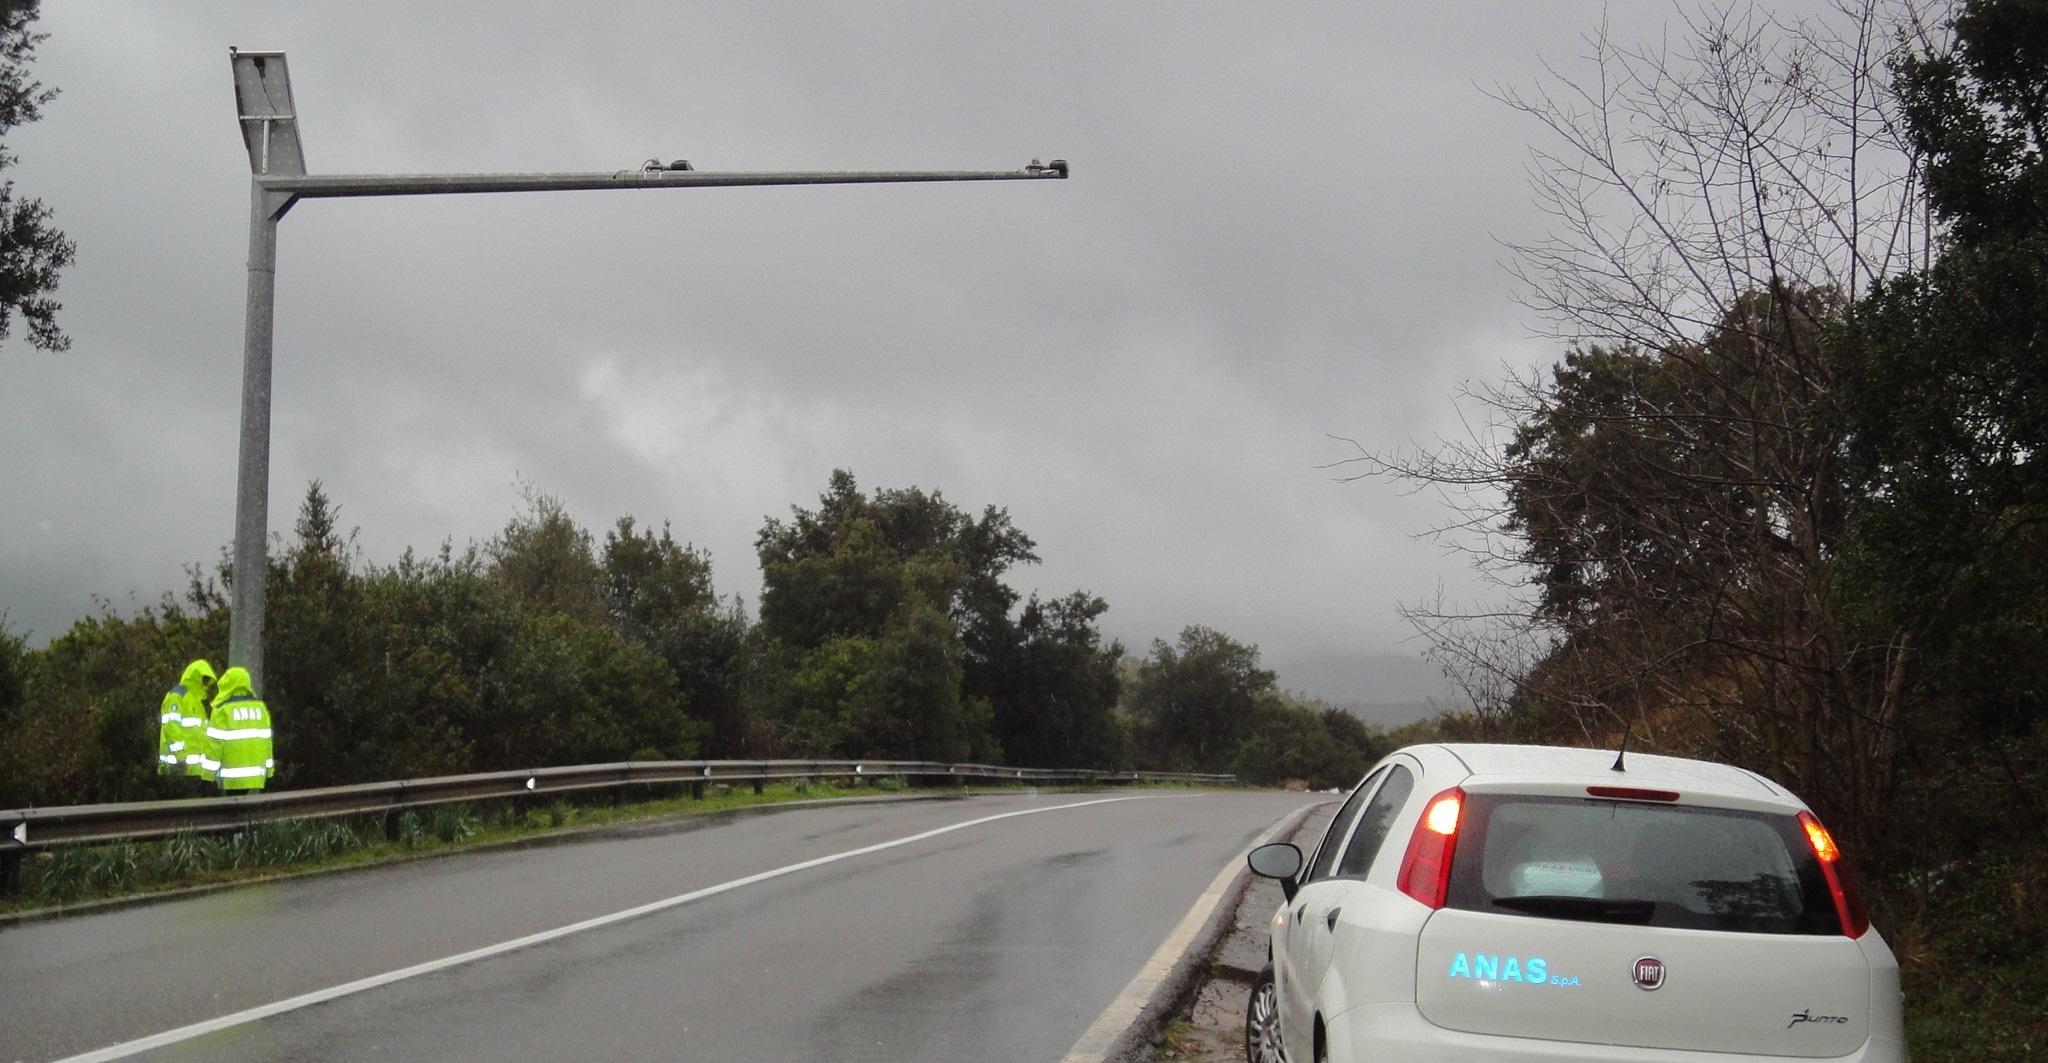 Immagine di sensori di traffico Anas